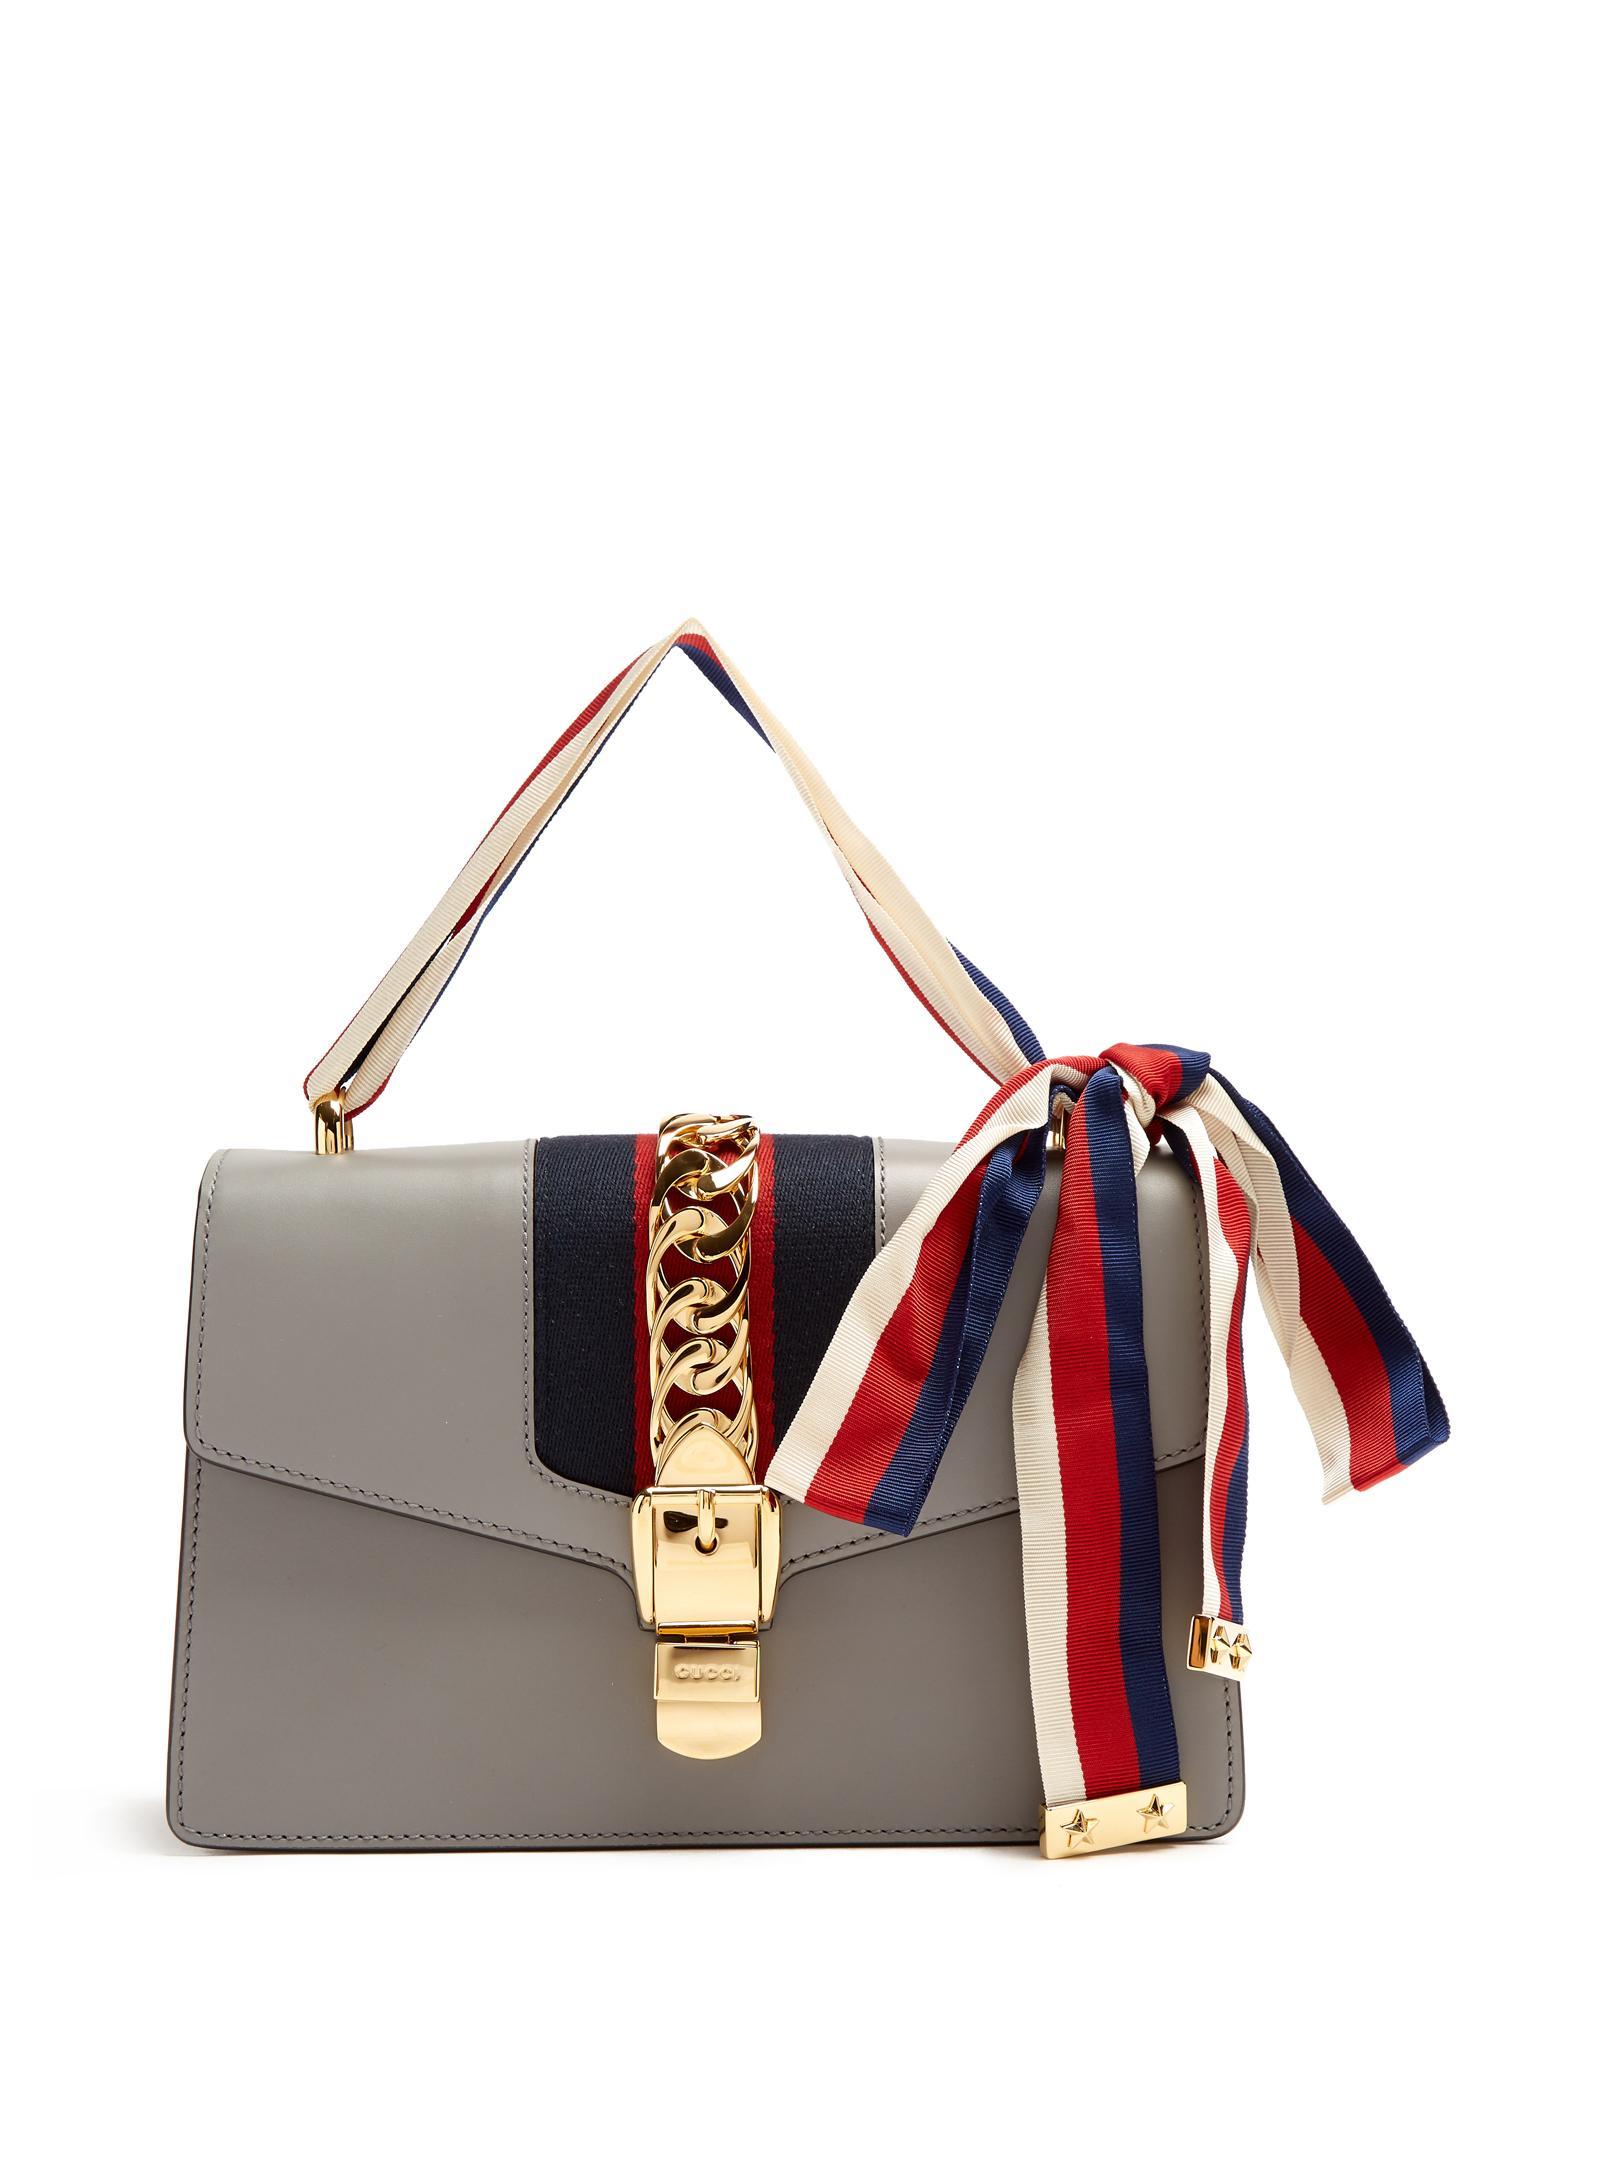 a19e079af58 Gucci Sylvie Leather Shoulder Bag in Gray - Lyst